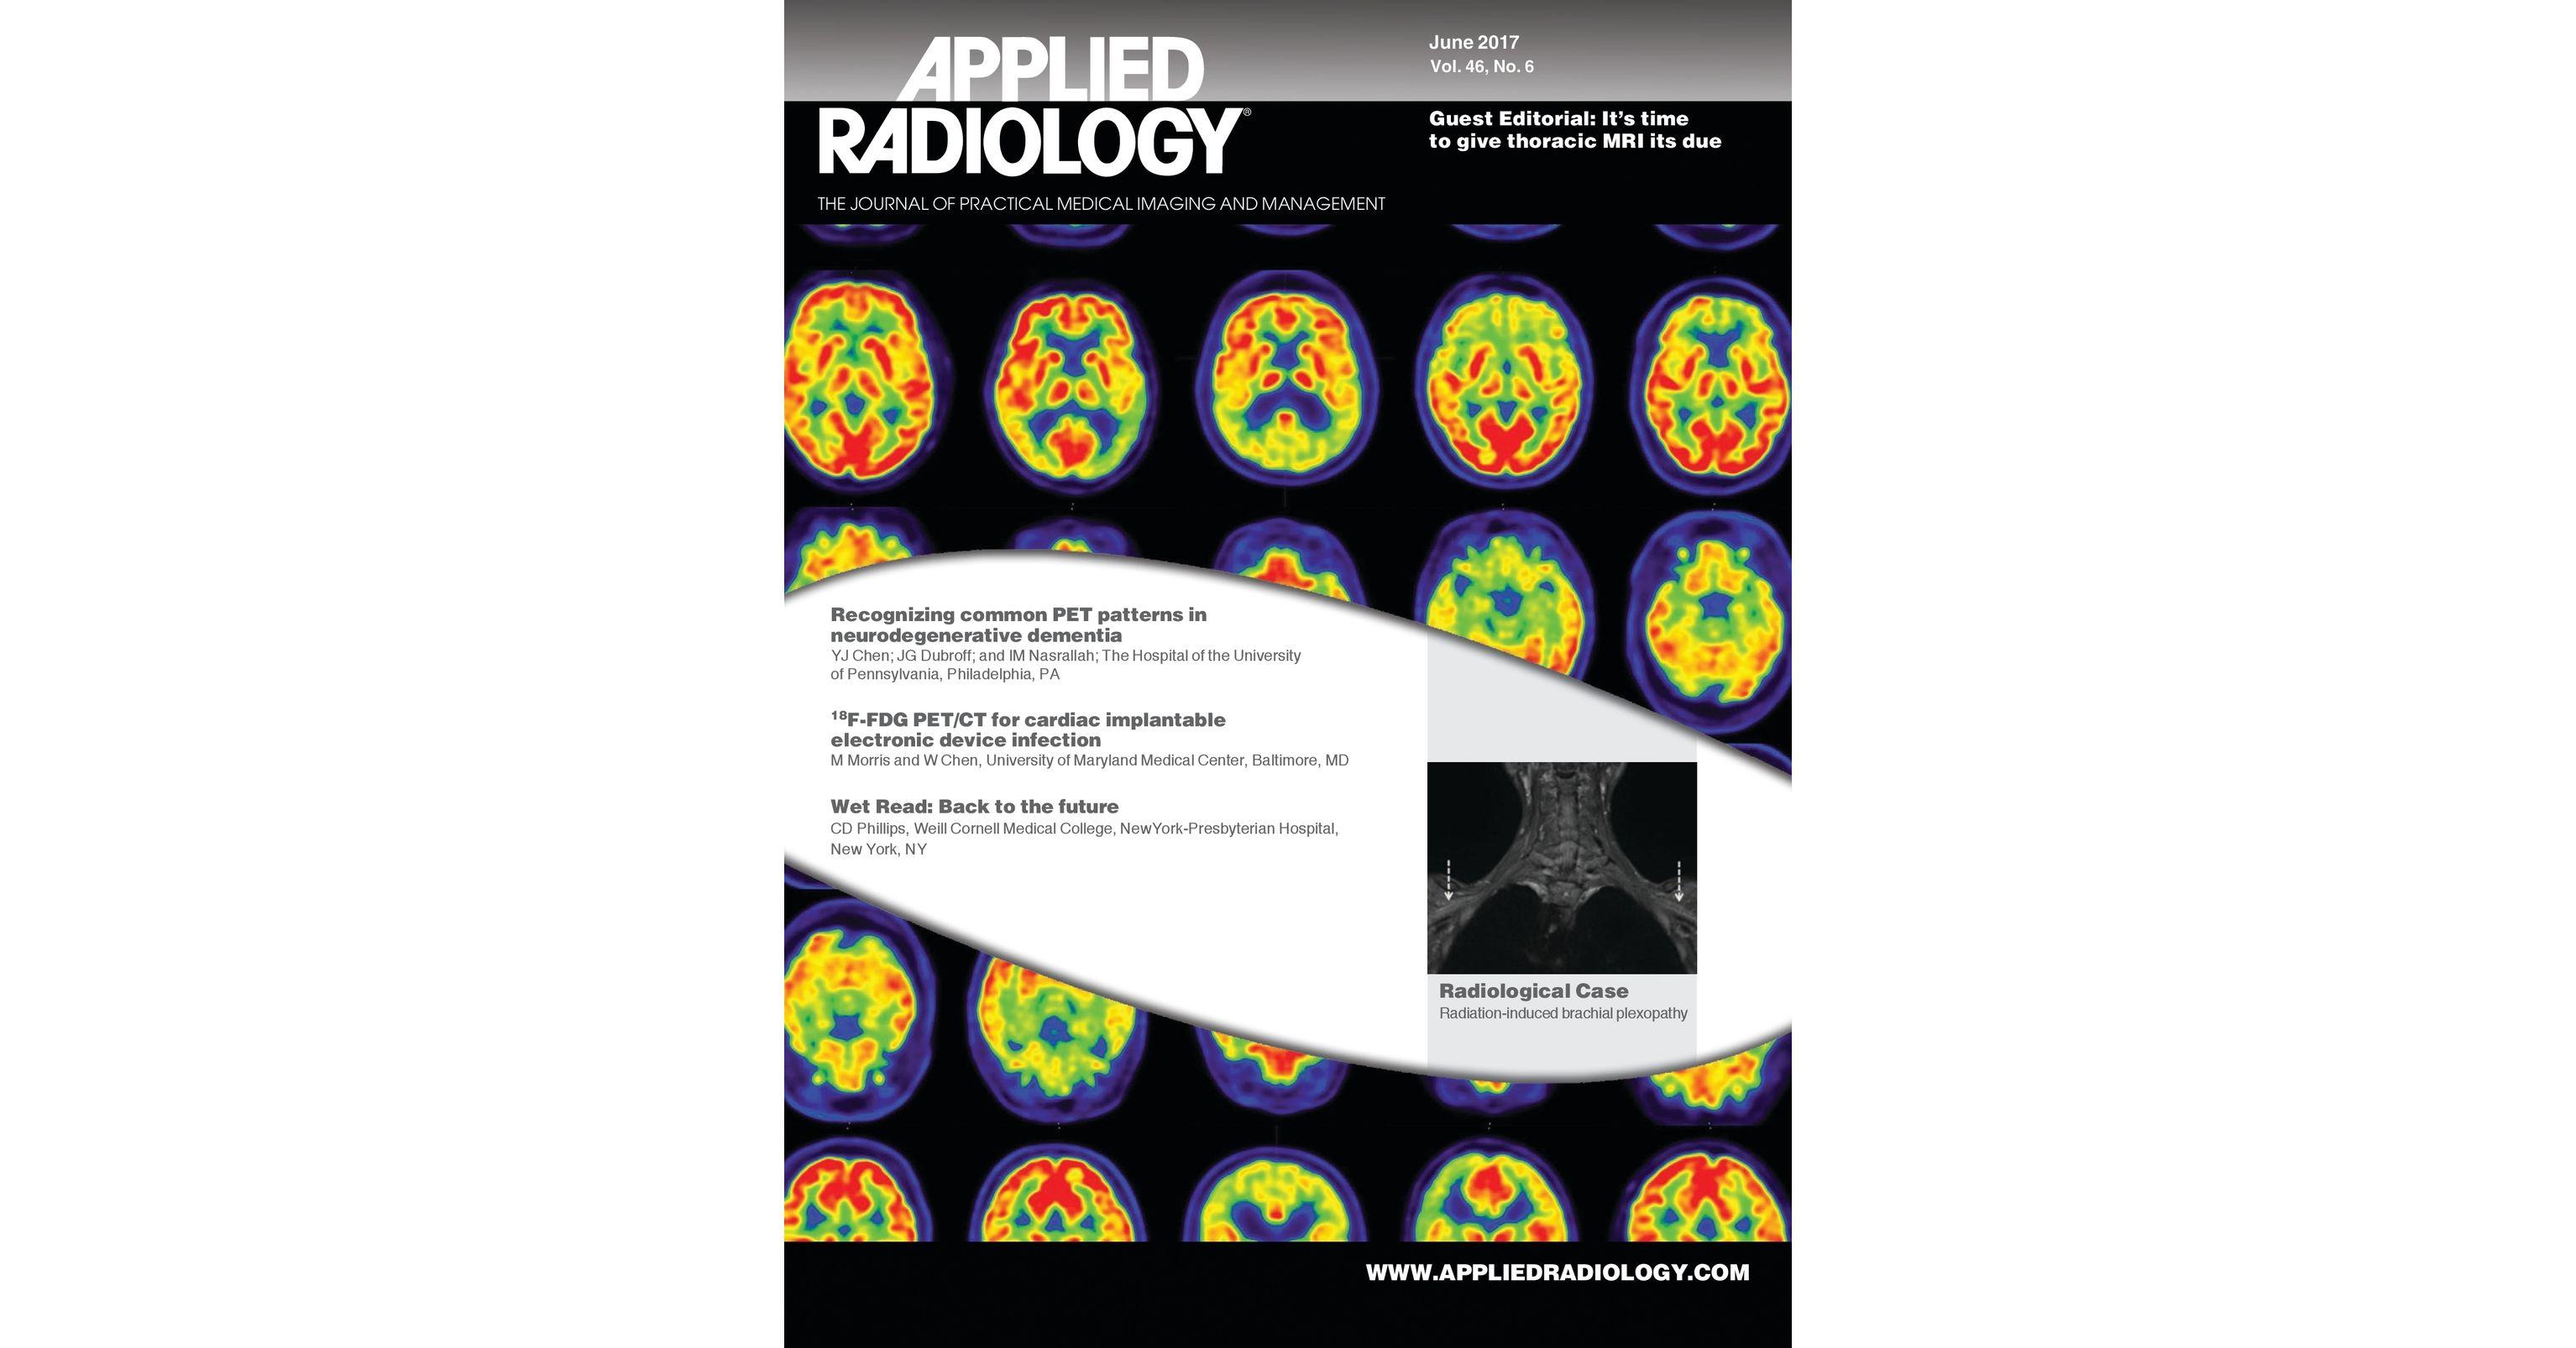 June 2017 Applied Radiology